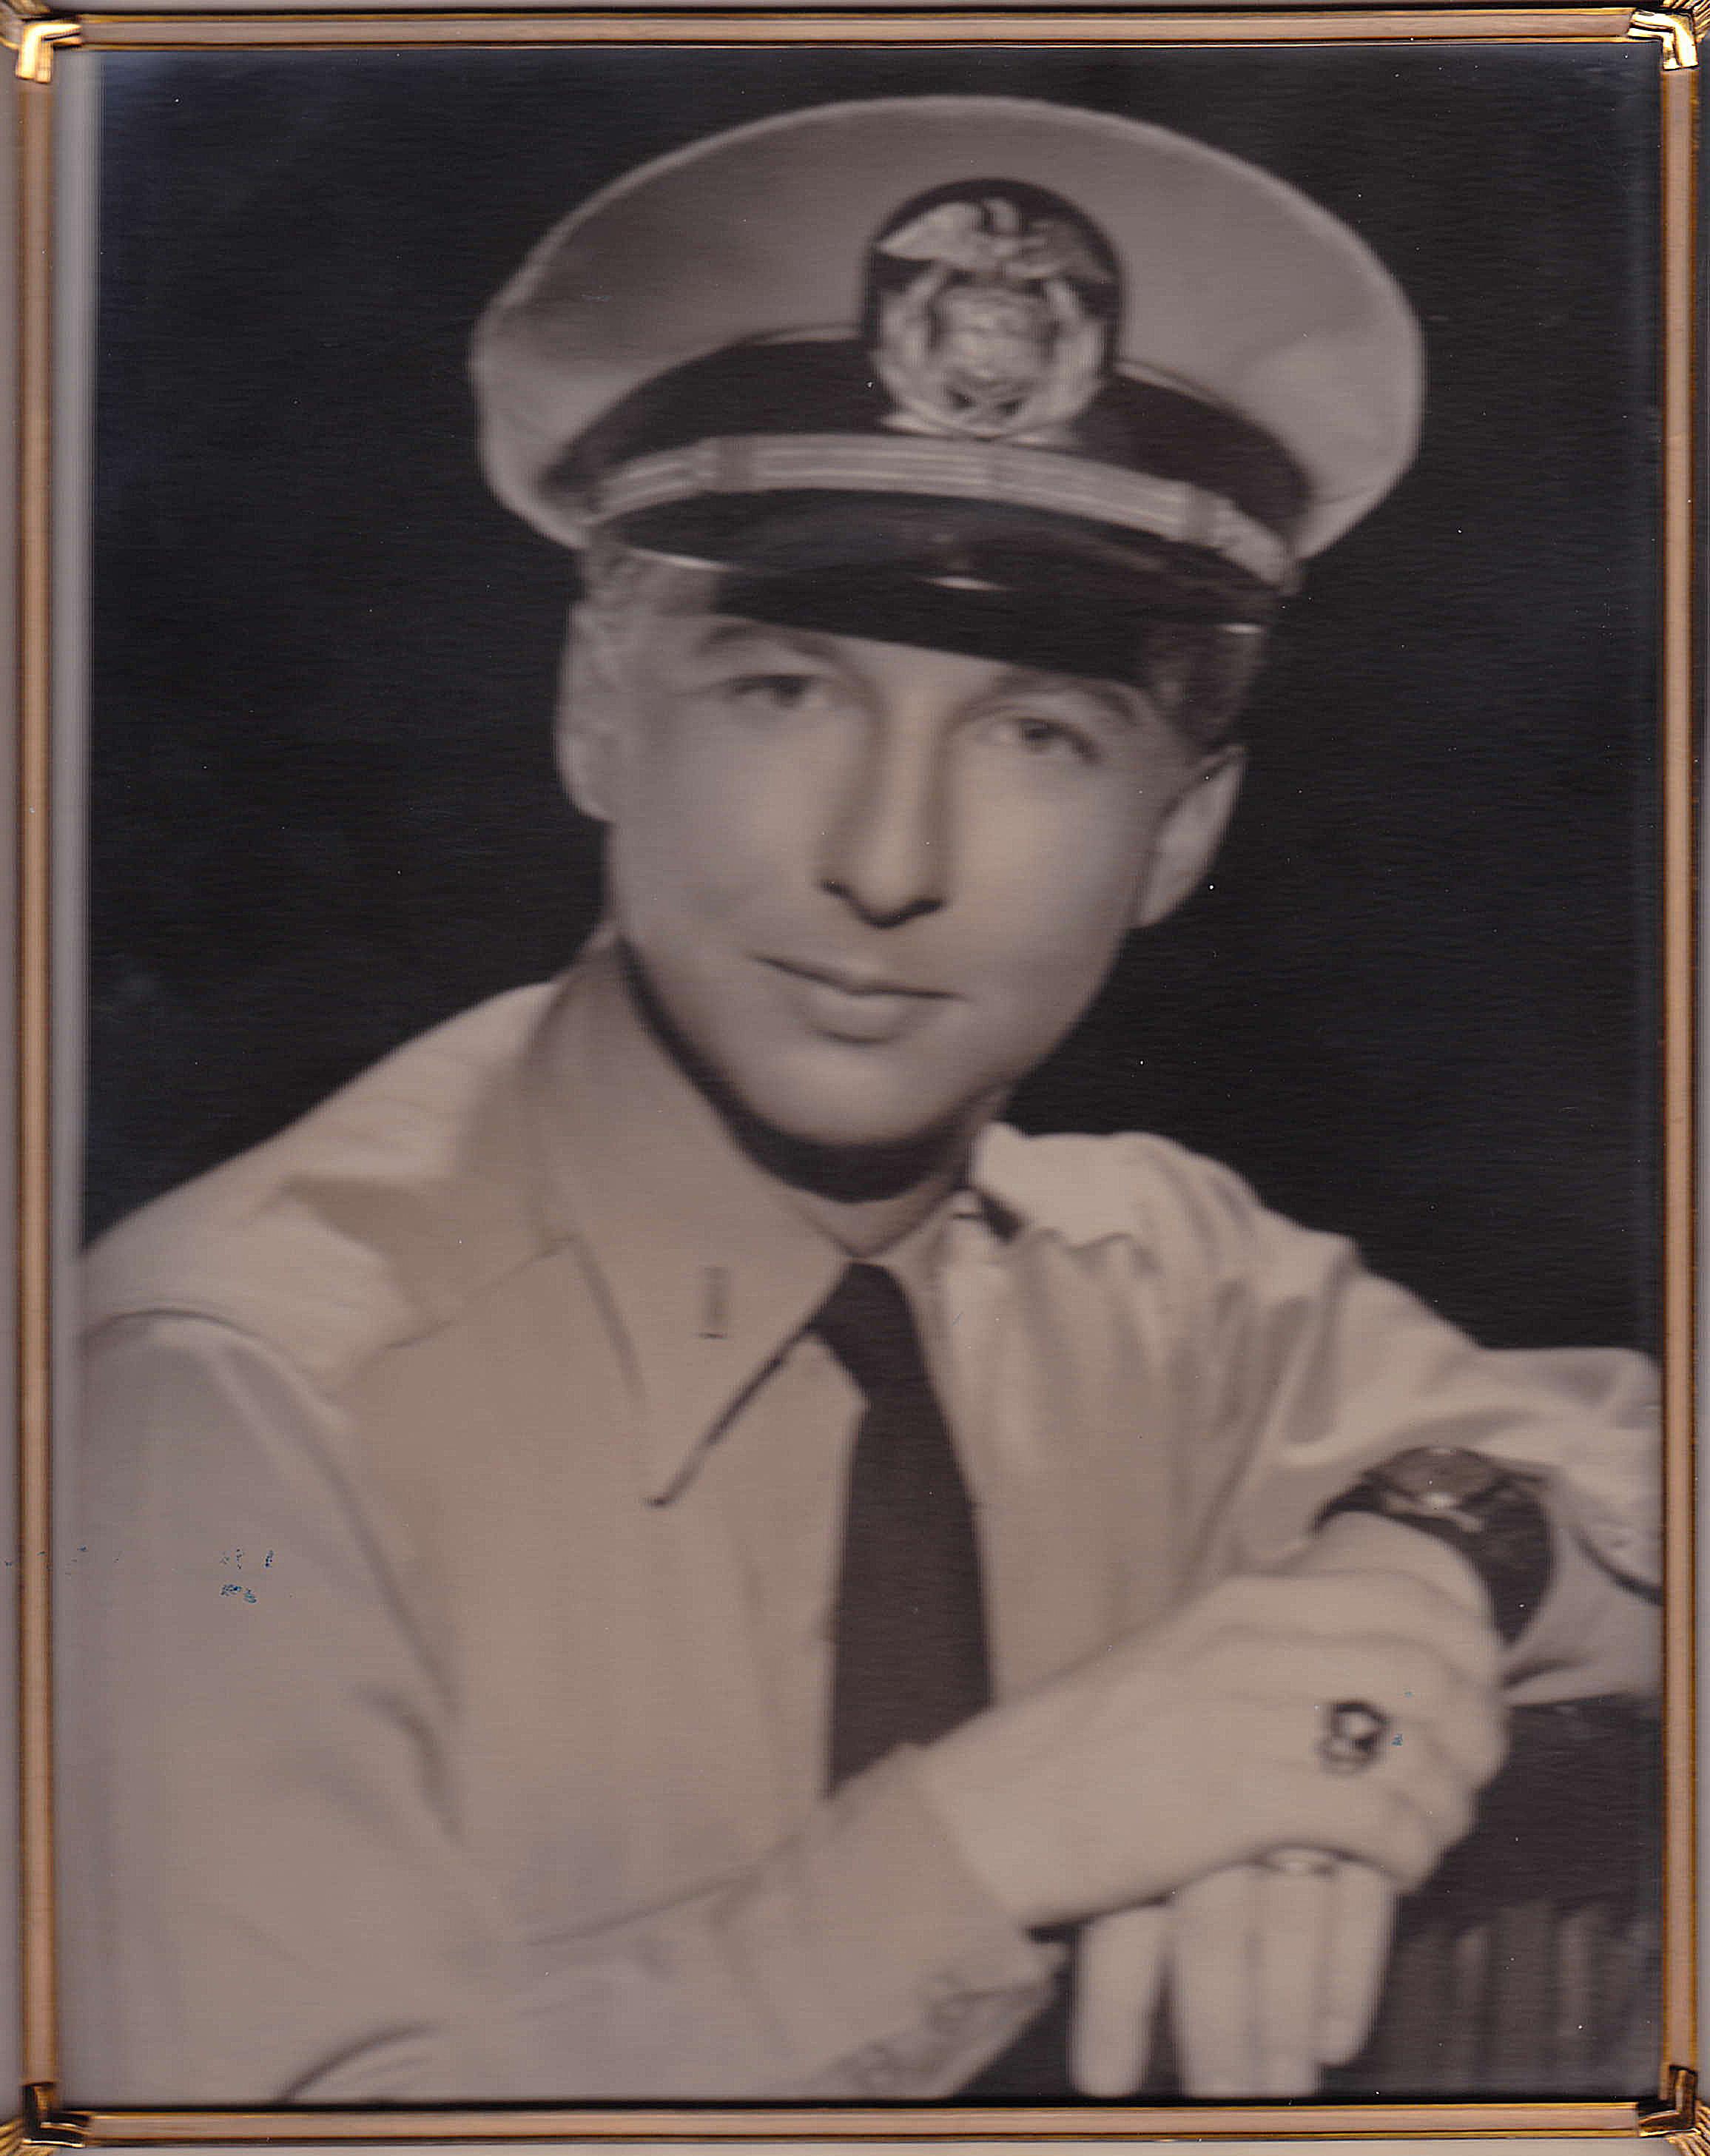 Capt. Metcalf (Gramps to me)